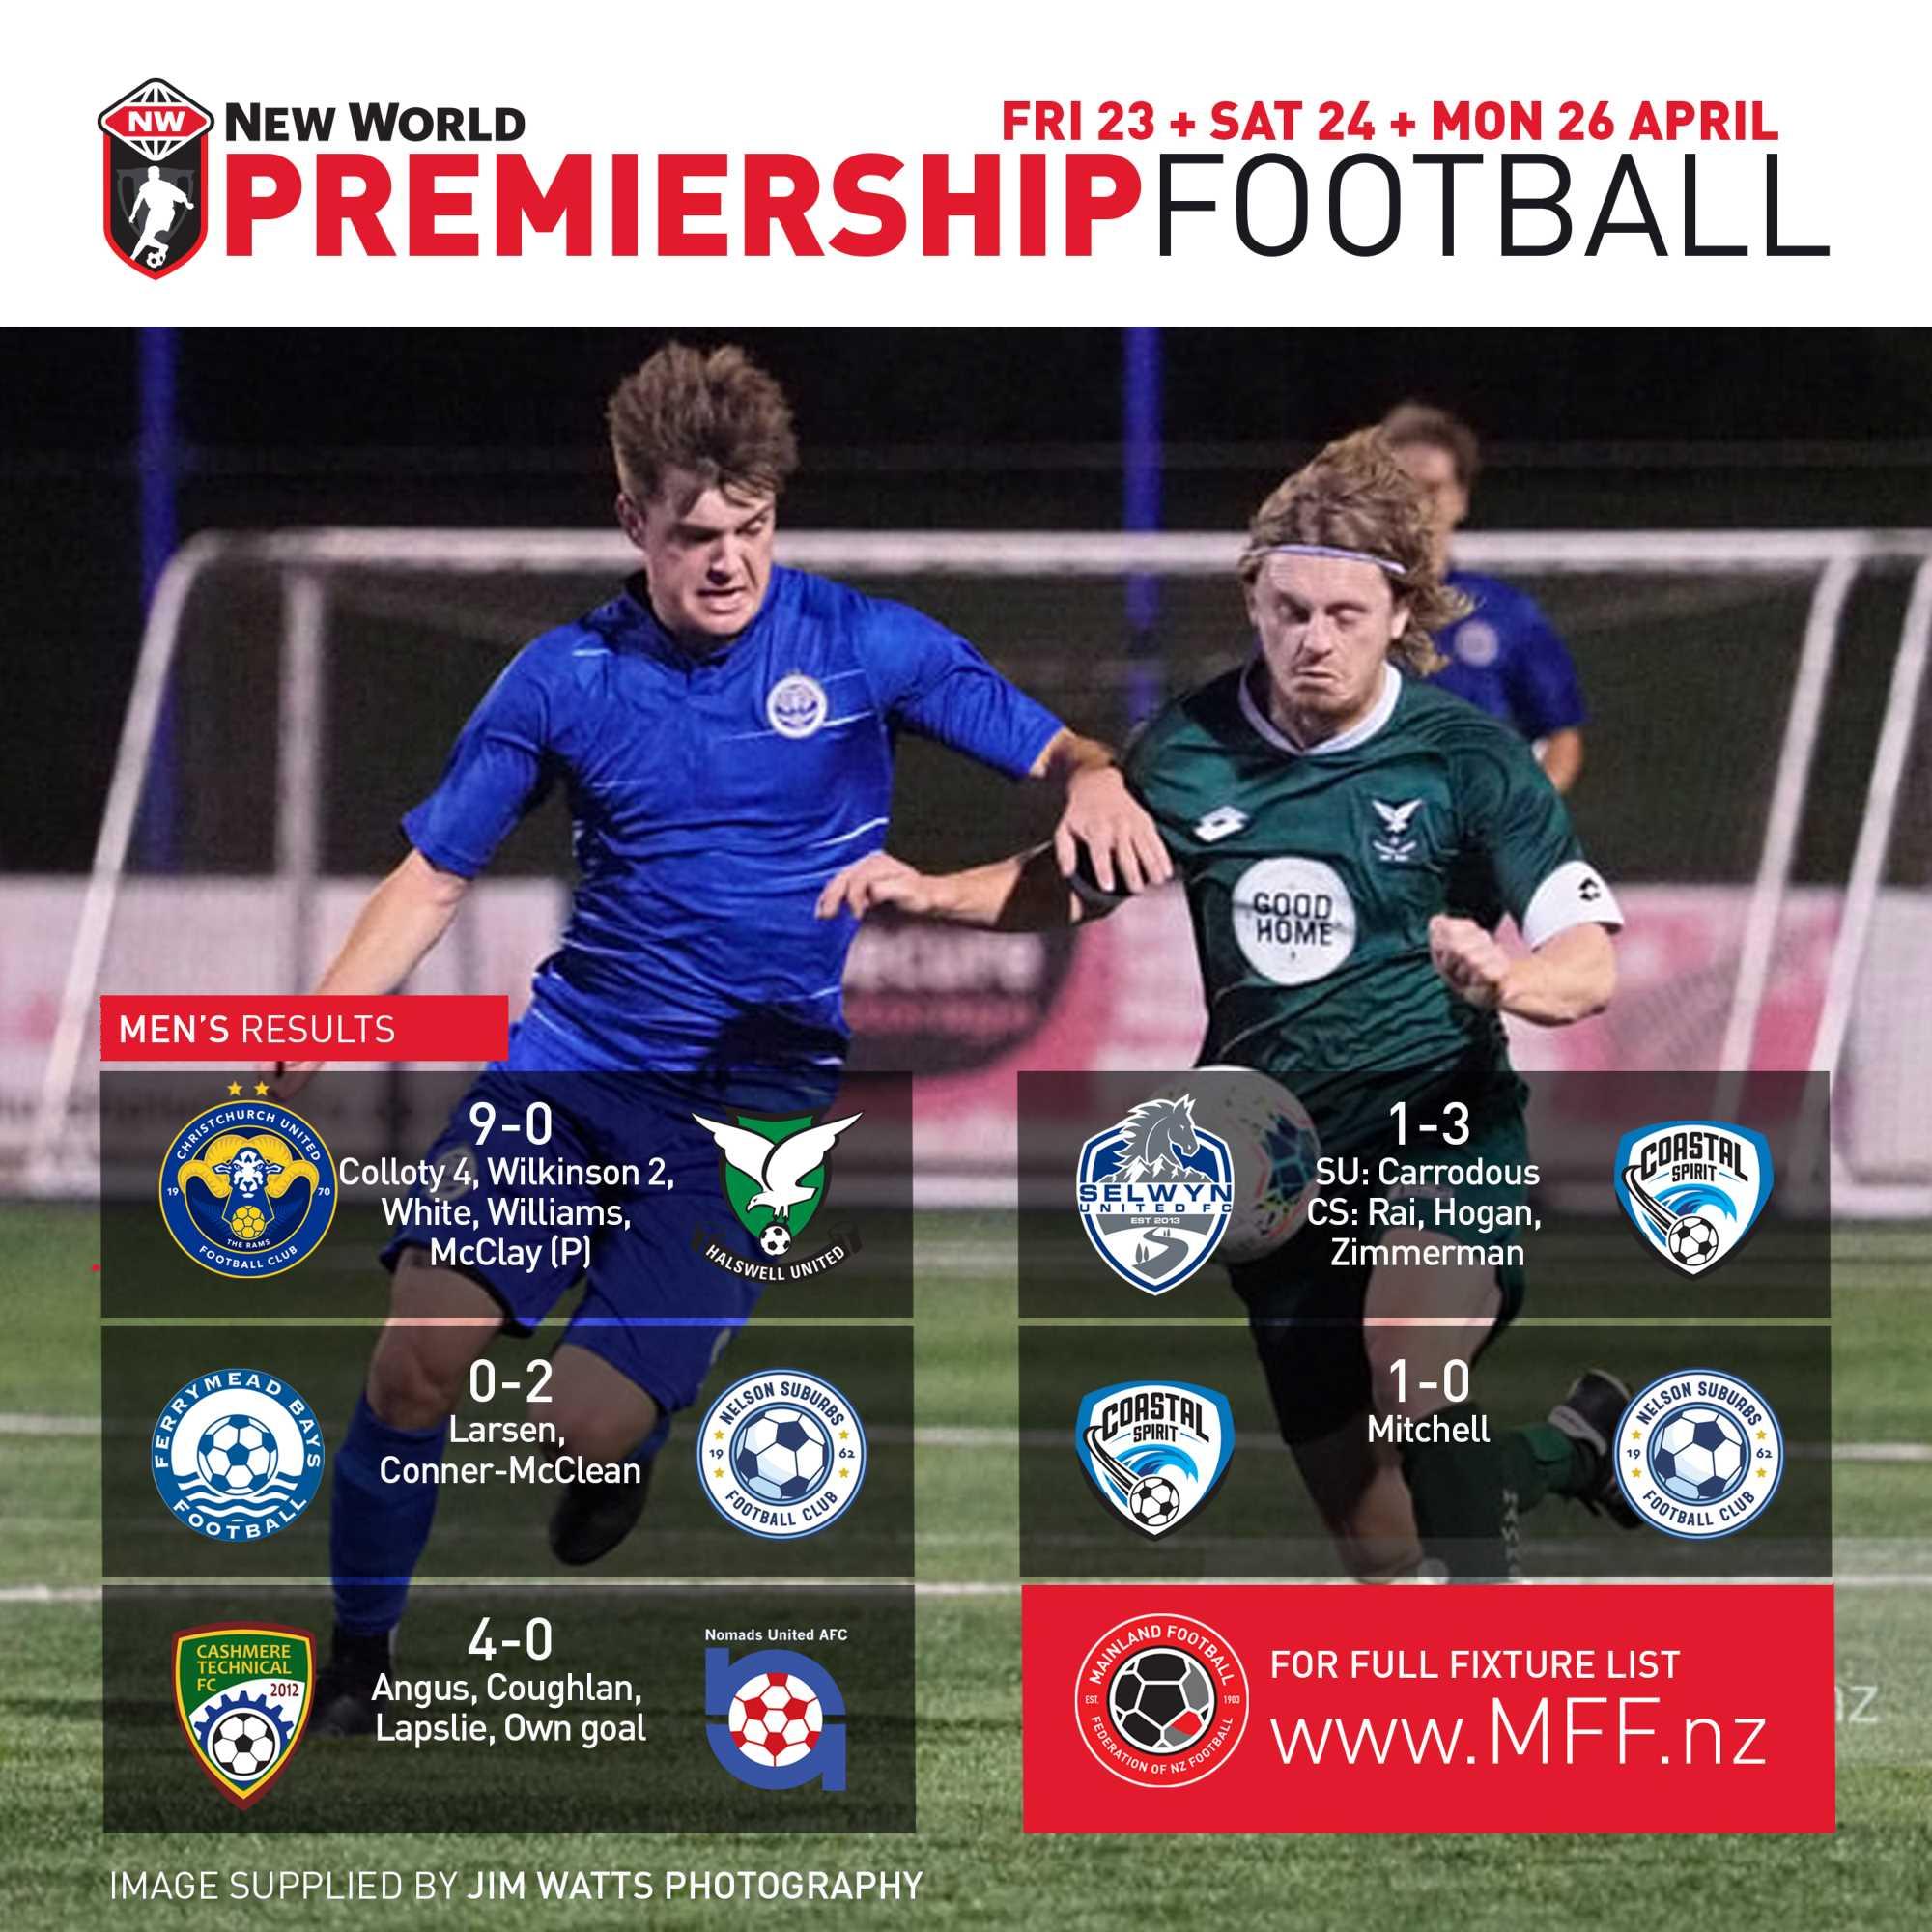 Image: mainlandfootball.co.nz